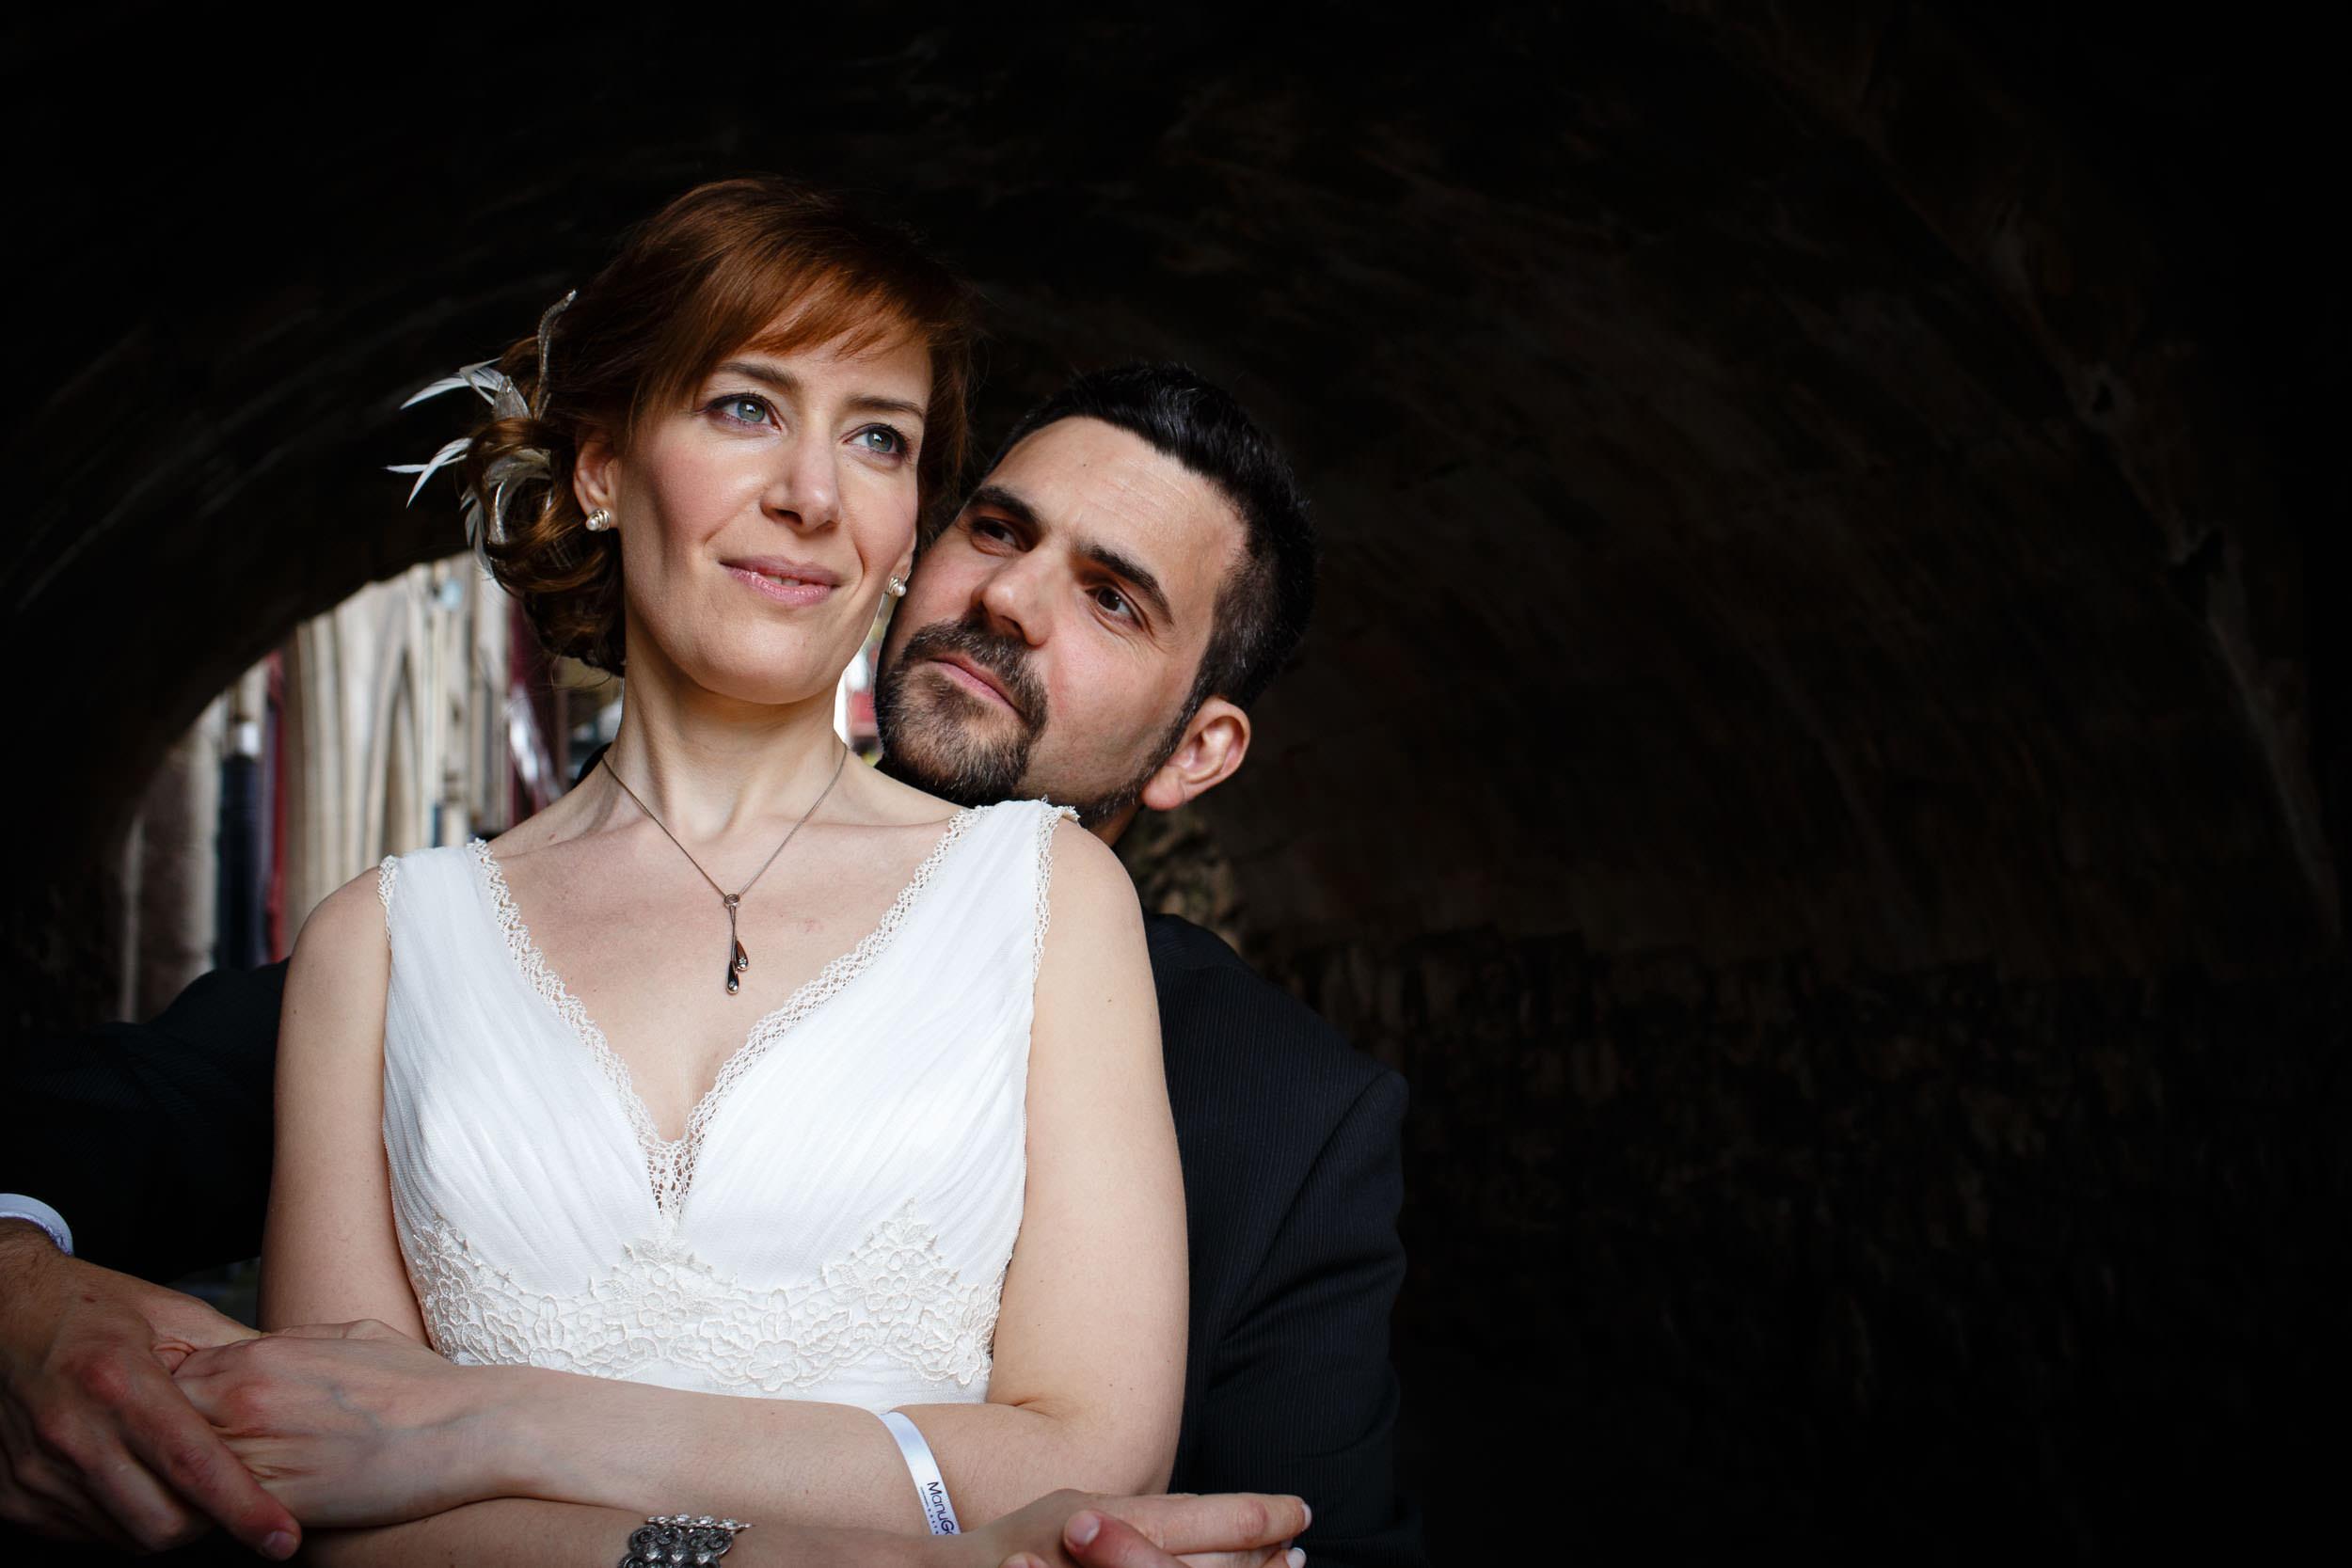 Engagement photography in Portugalete, Basque Country, Spain - James Sturcke  Photographer | sturcke.org_008.jpg